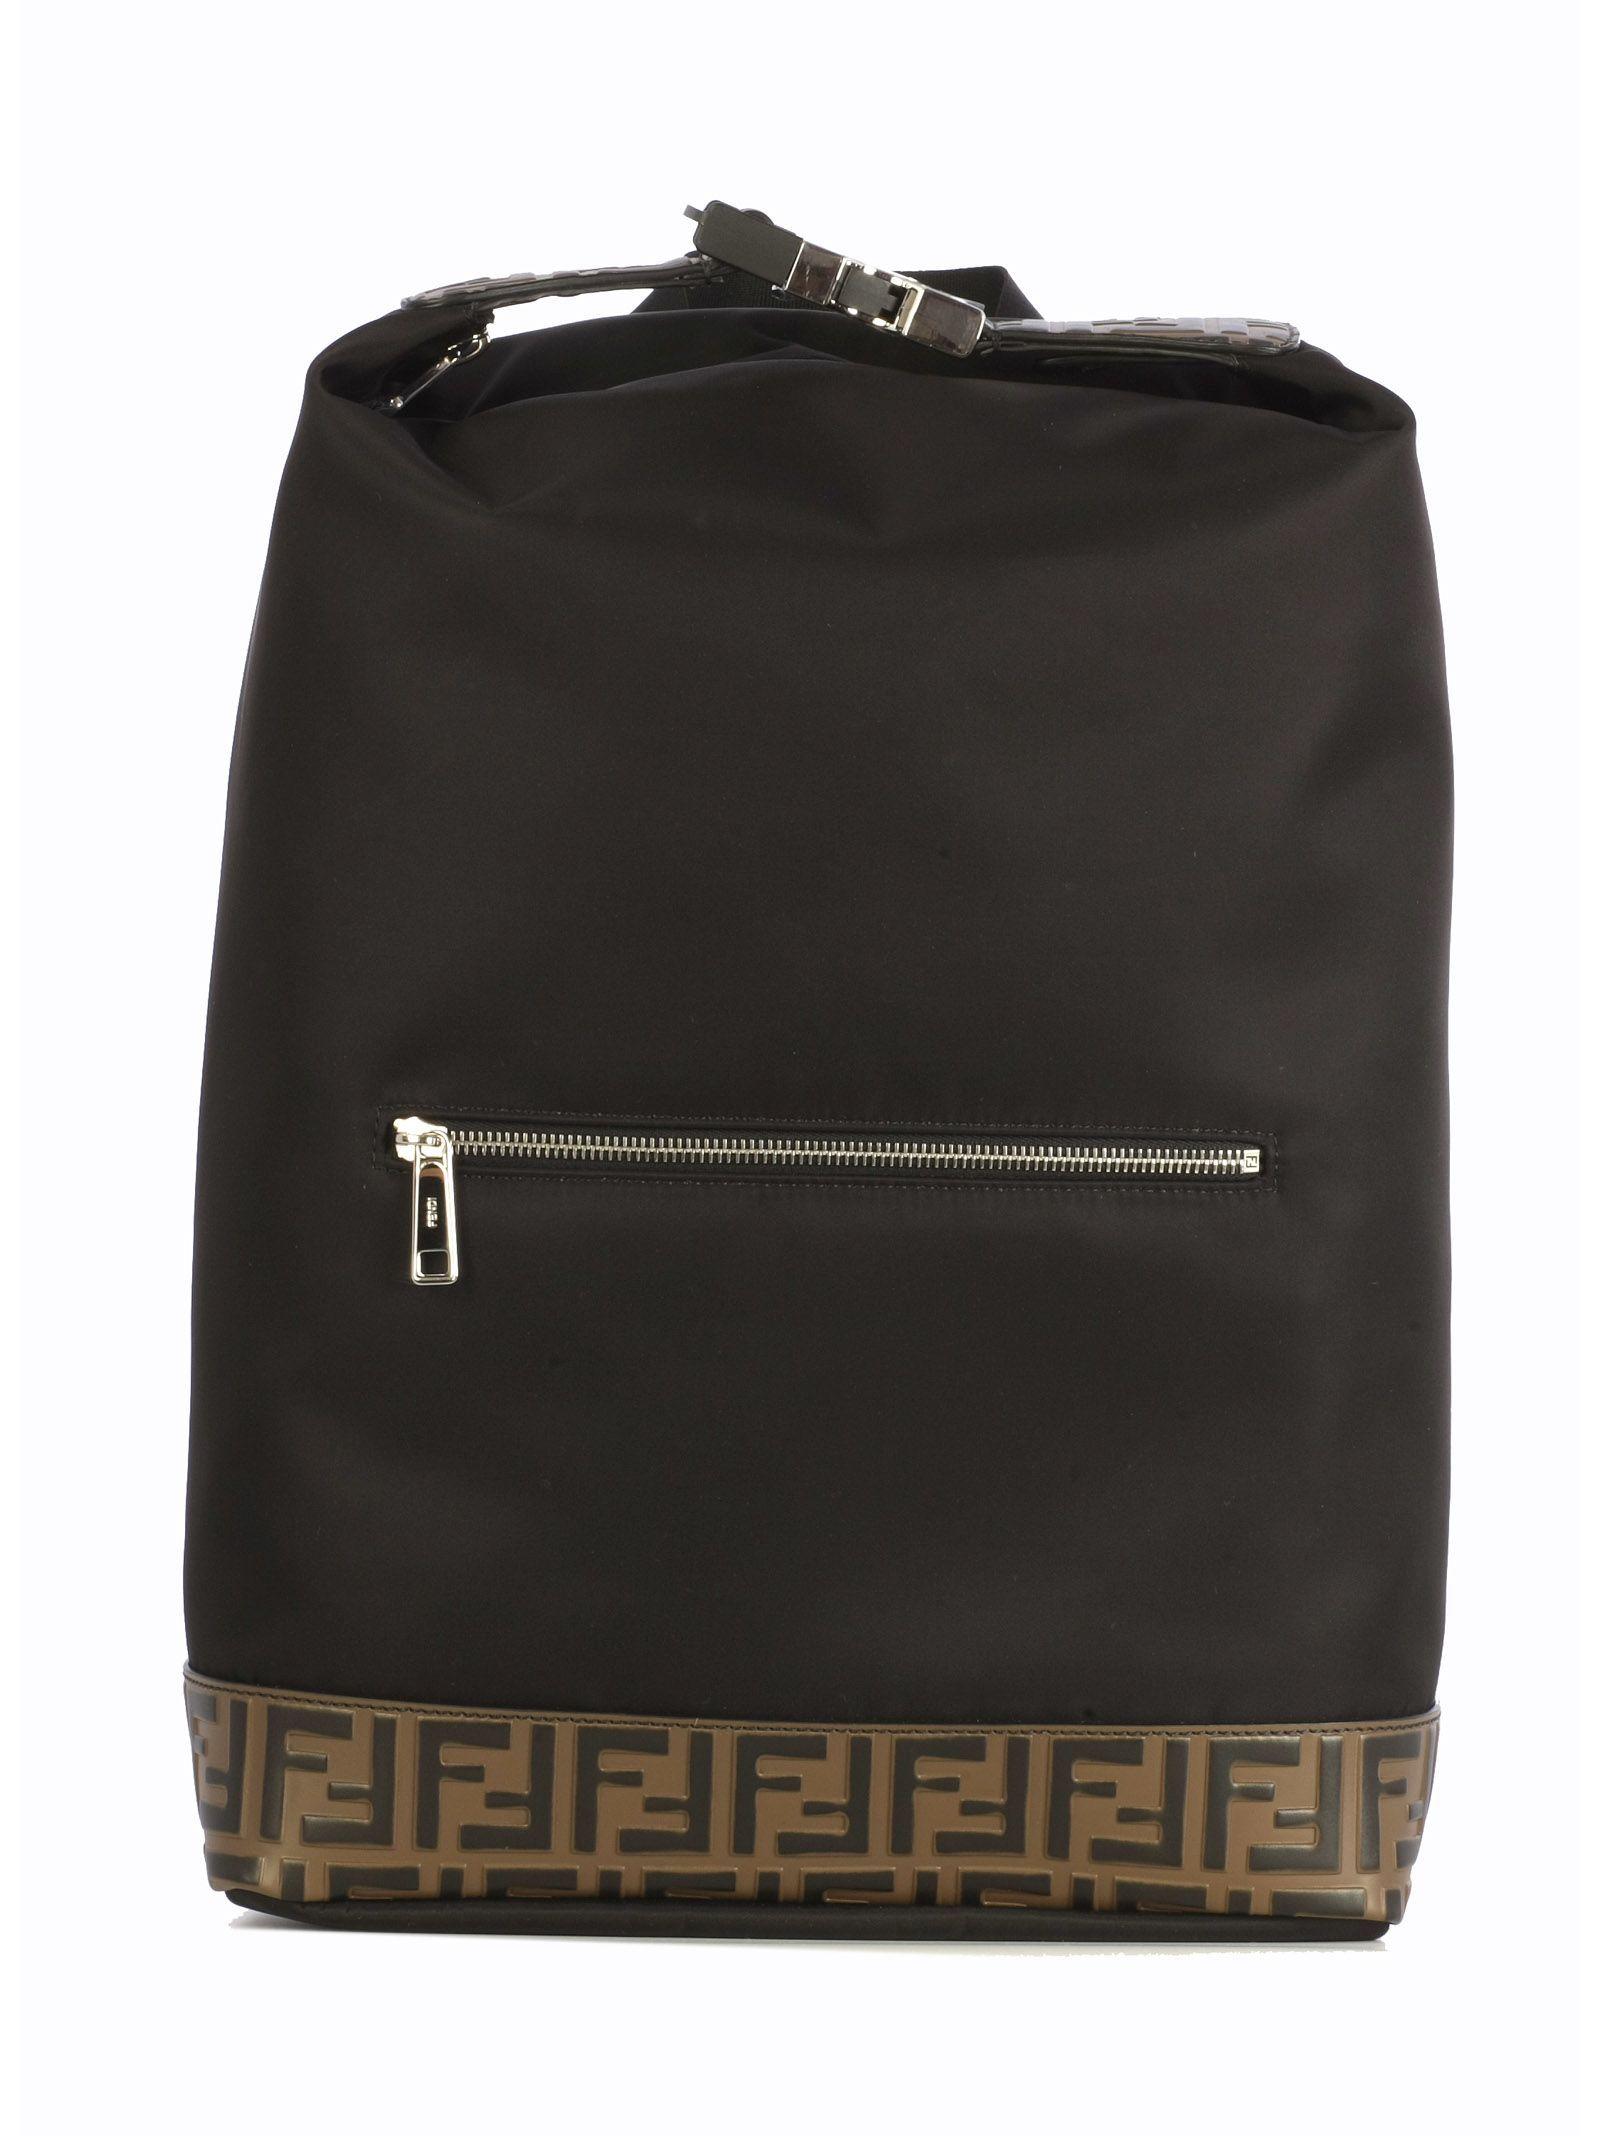 c0fb04e8 FENDI NYLON SANTANDE MONOGRAM LOGO. #fendi #bags #nylon # | Fendi ...